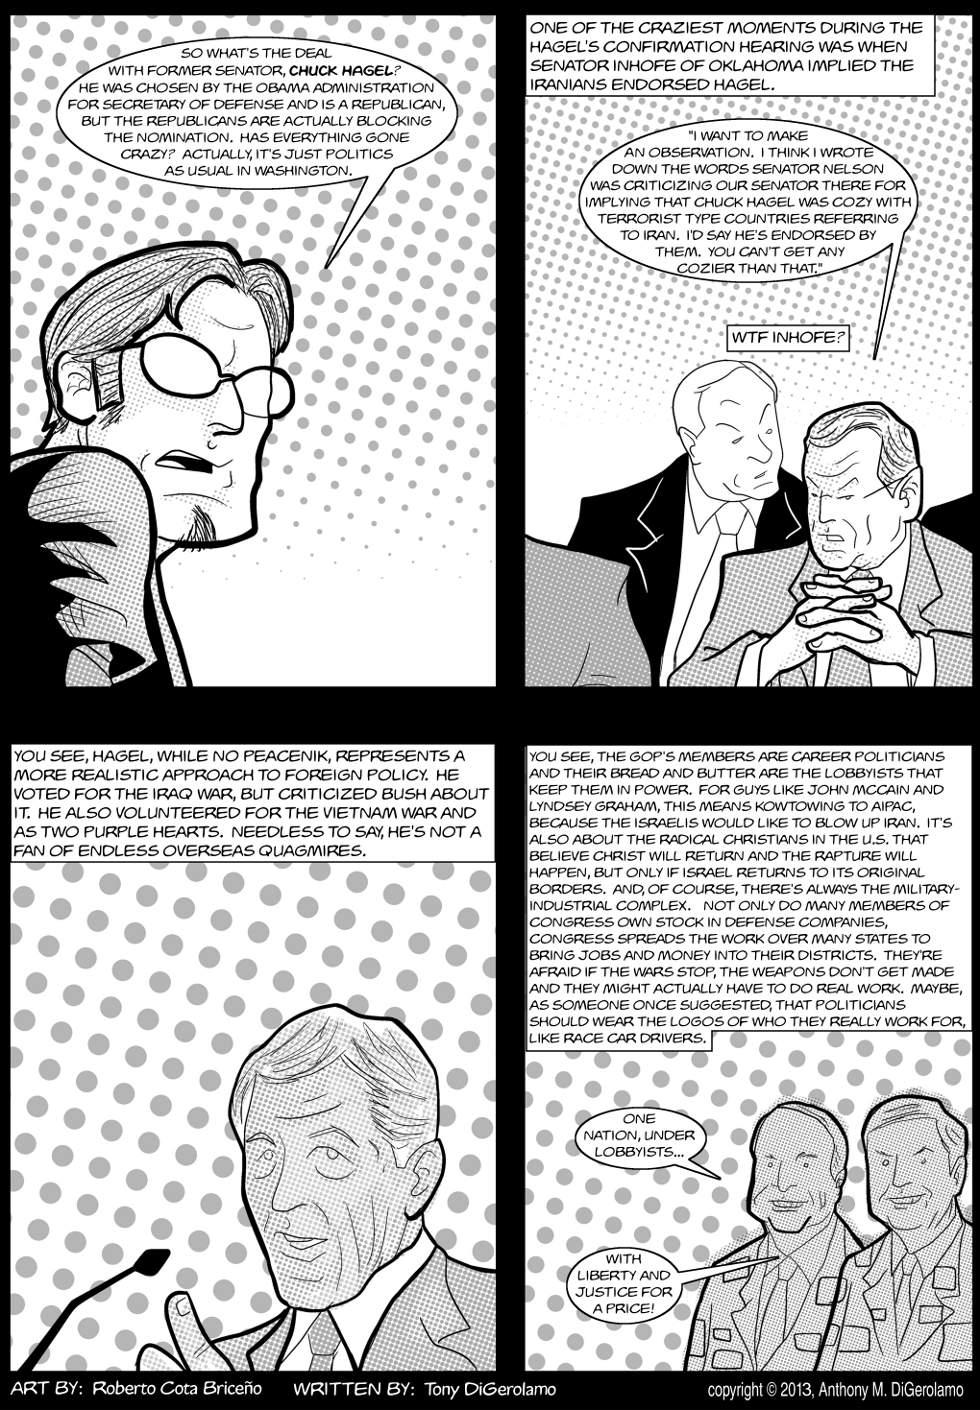 The Antiwar Comic: The Hagel Kerfuffle